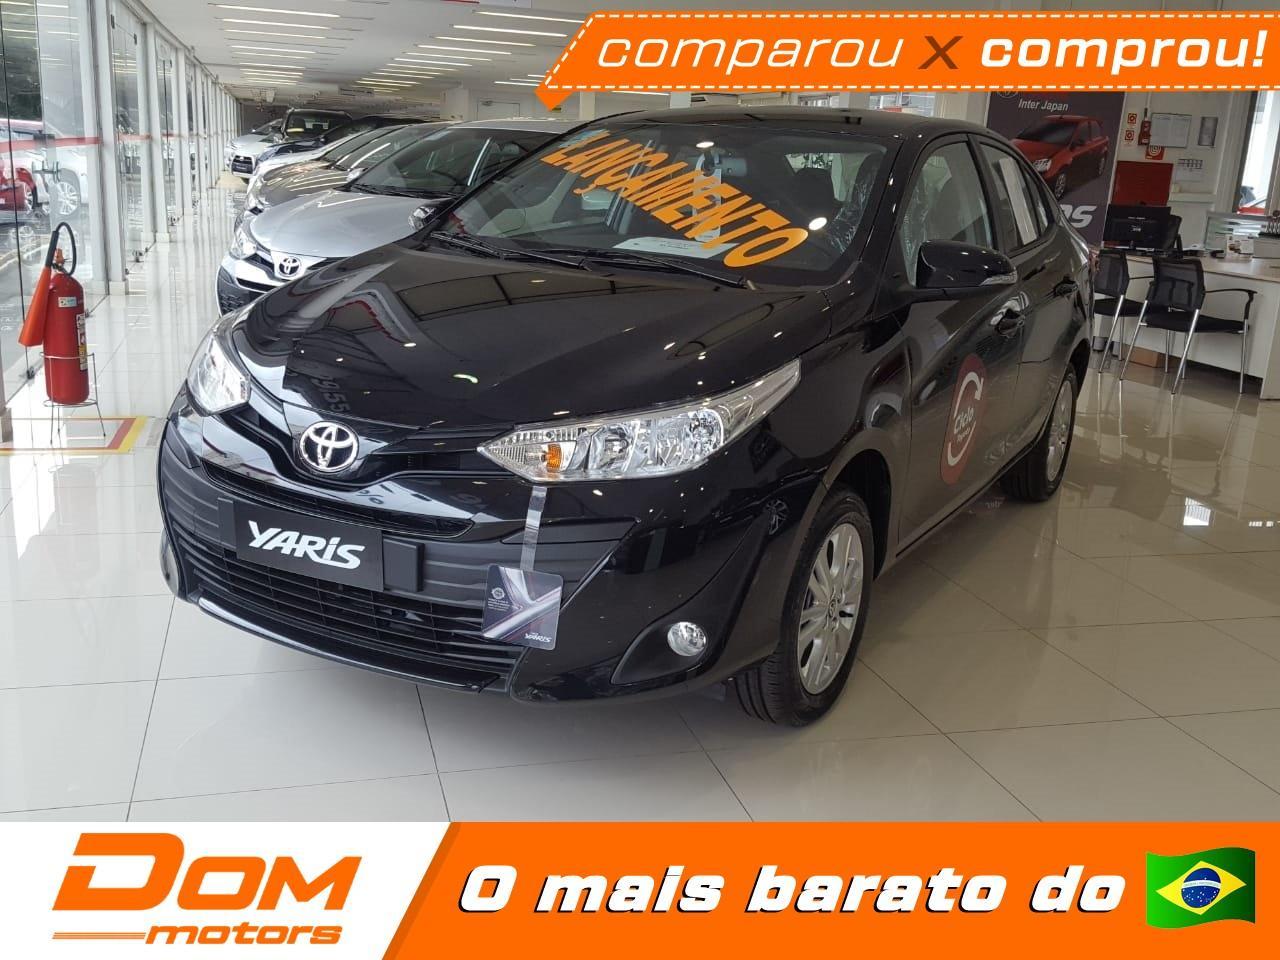 TOYOTA Yaris Sedan 1.5 16V 4P FLEX XL PLUS TECH MULTIDRIVE AUTOMÁTICO CVT, Foto 1